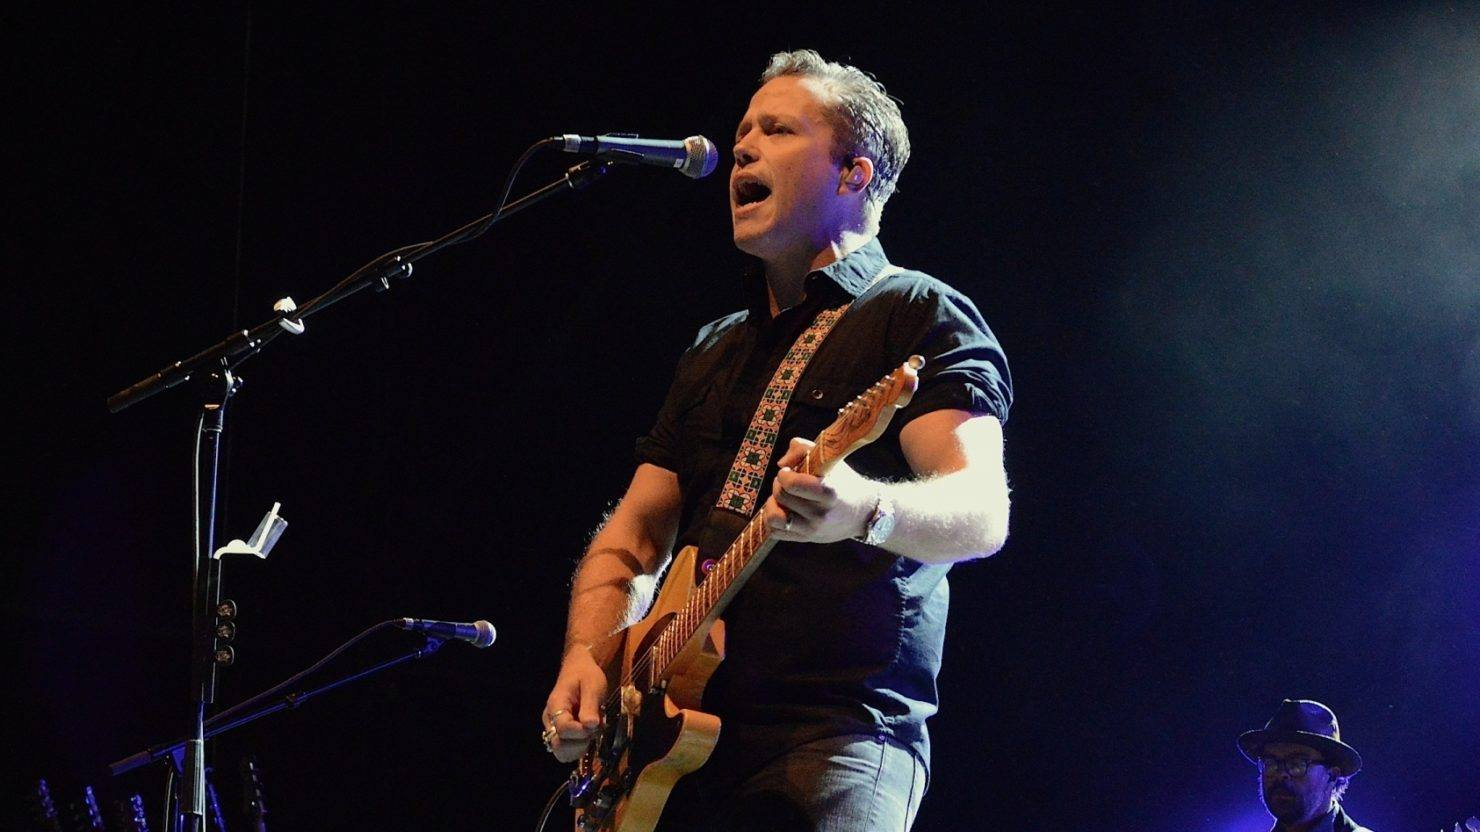 John mann tour dates